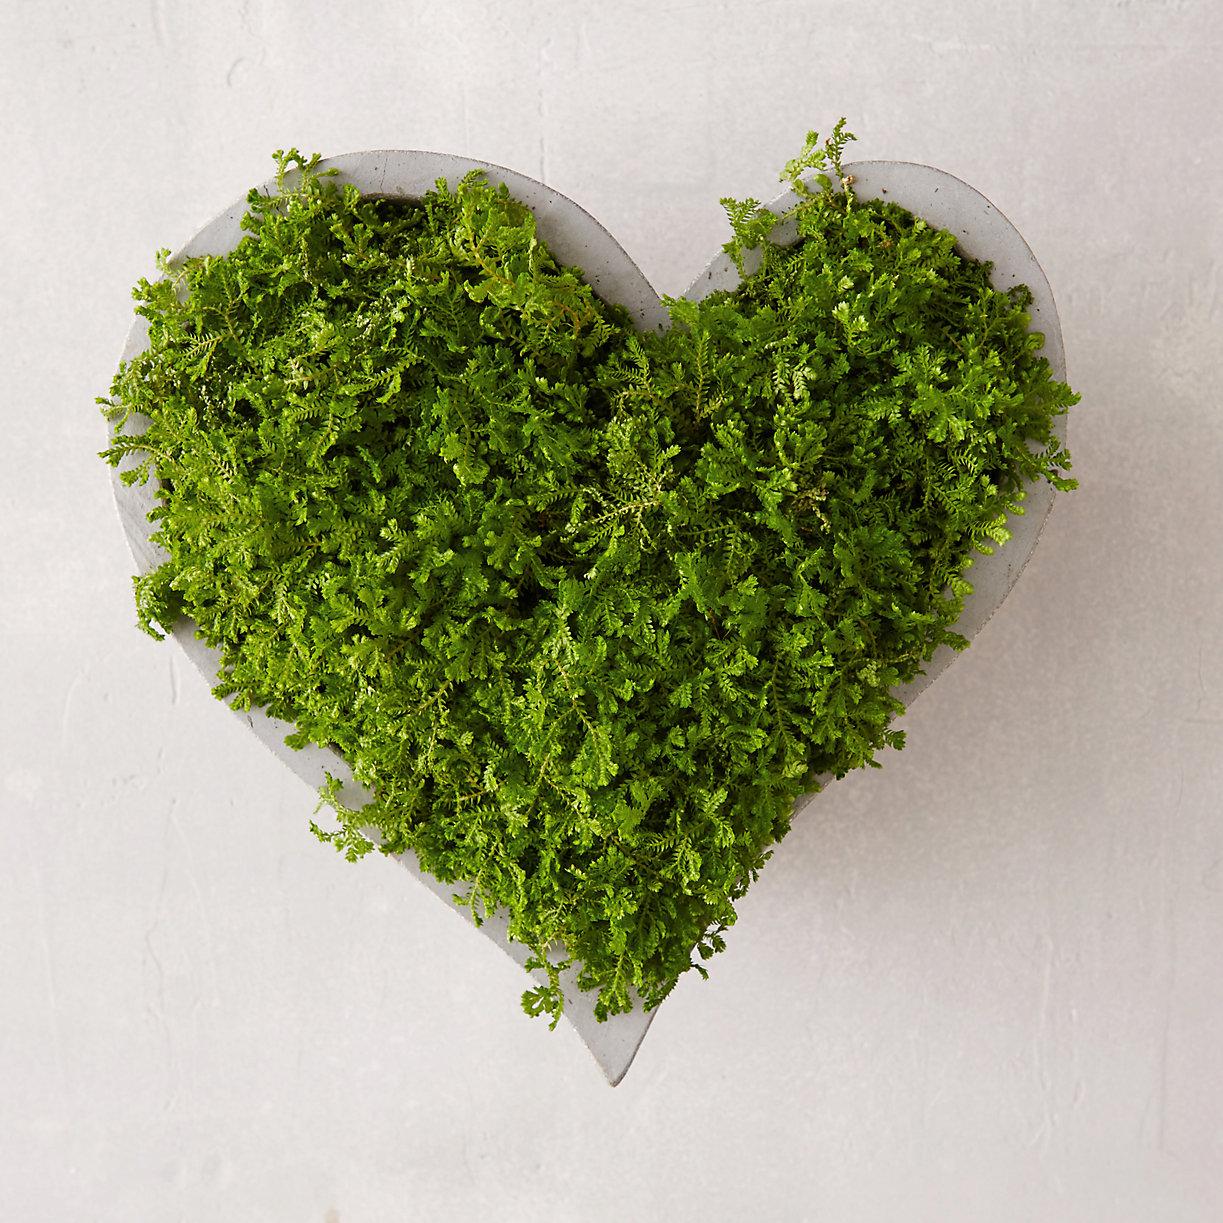 Heart-shaped planter from Terrain